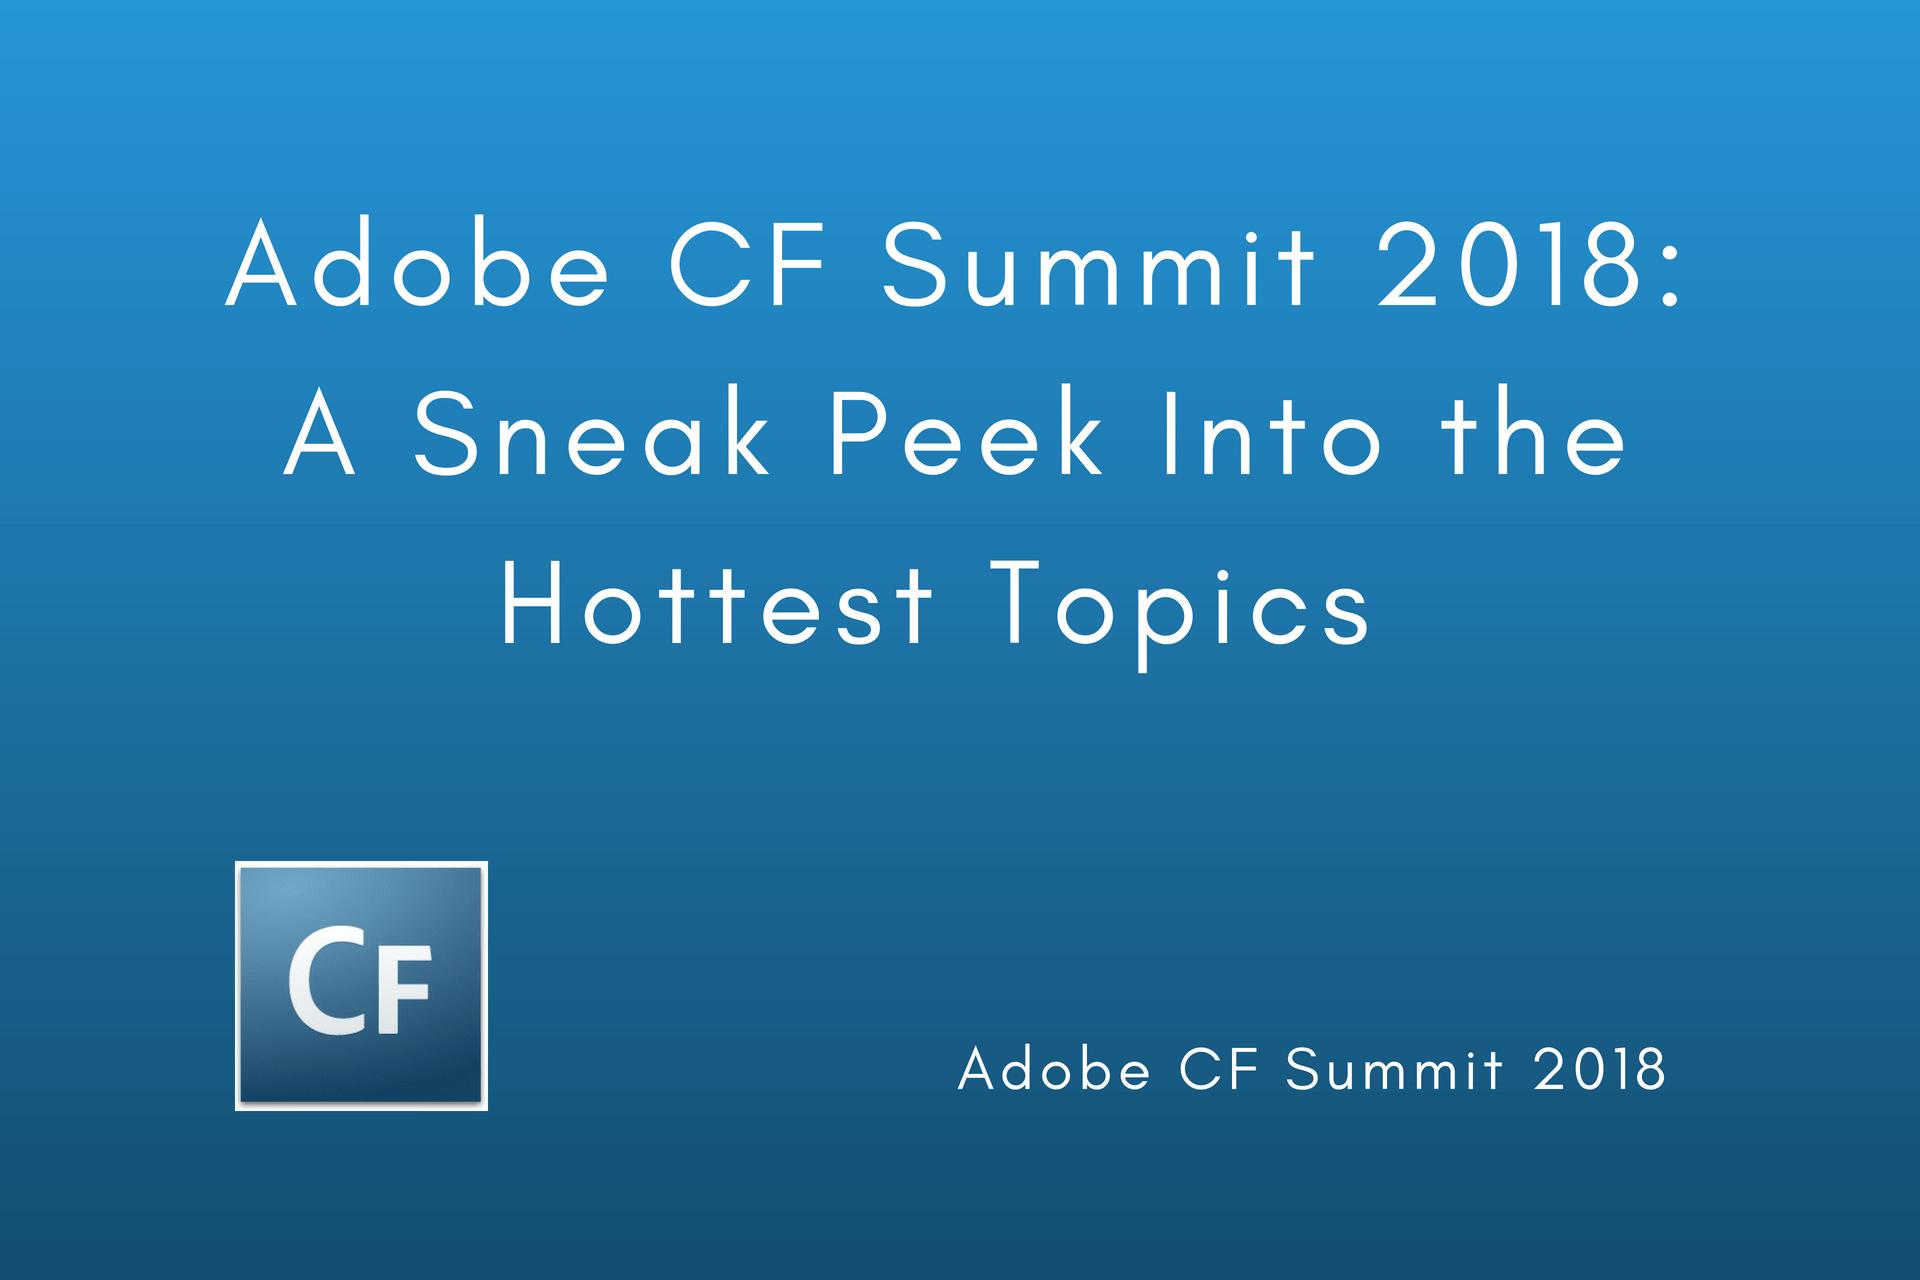 Adobe CF Summit 2018: A Sneak Peek Into the Hottest Topics